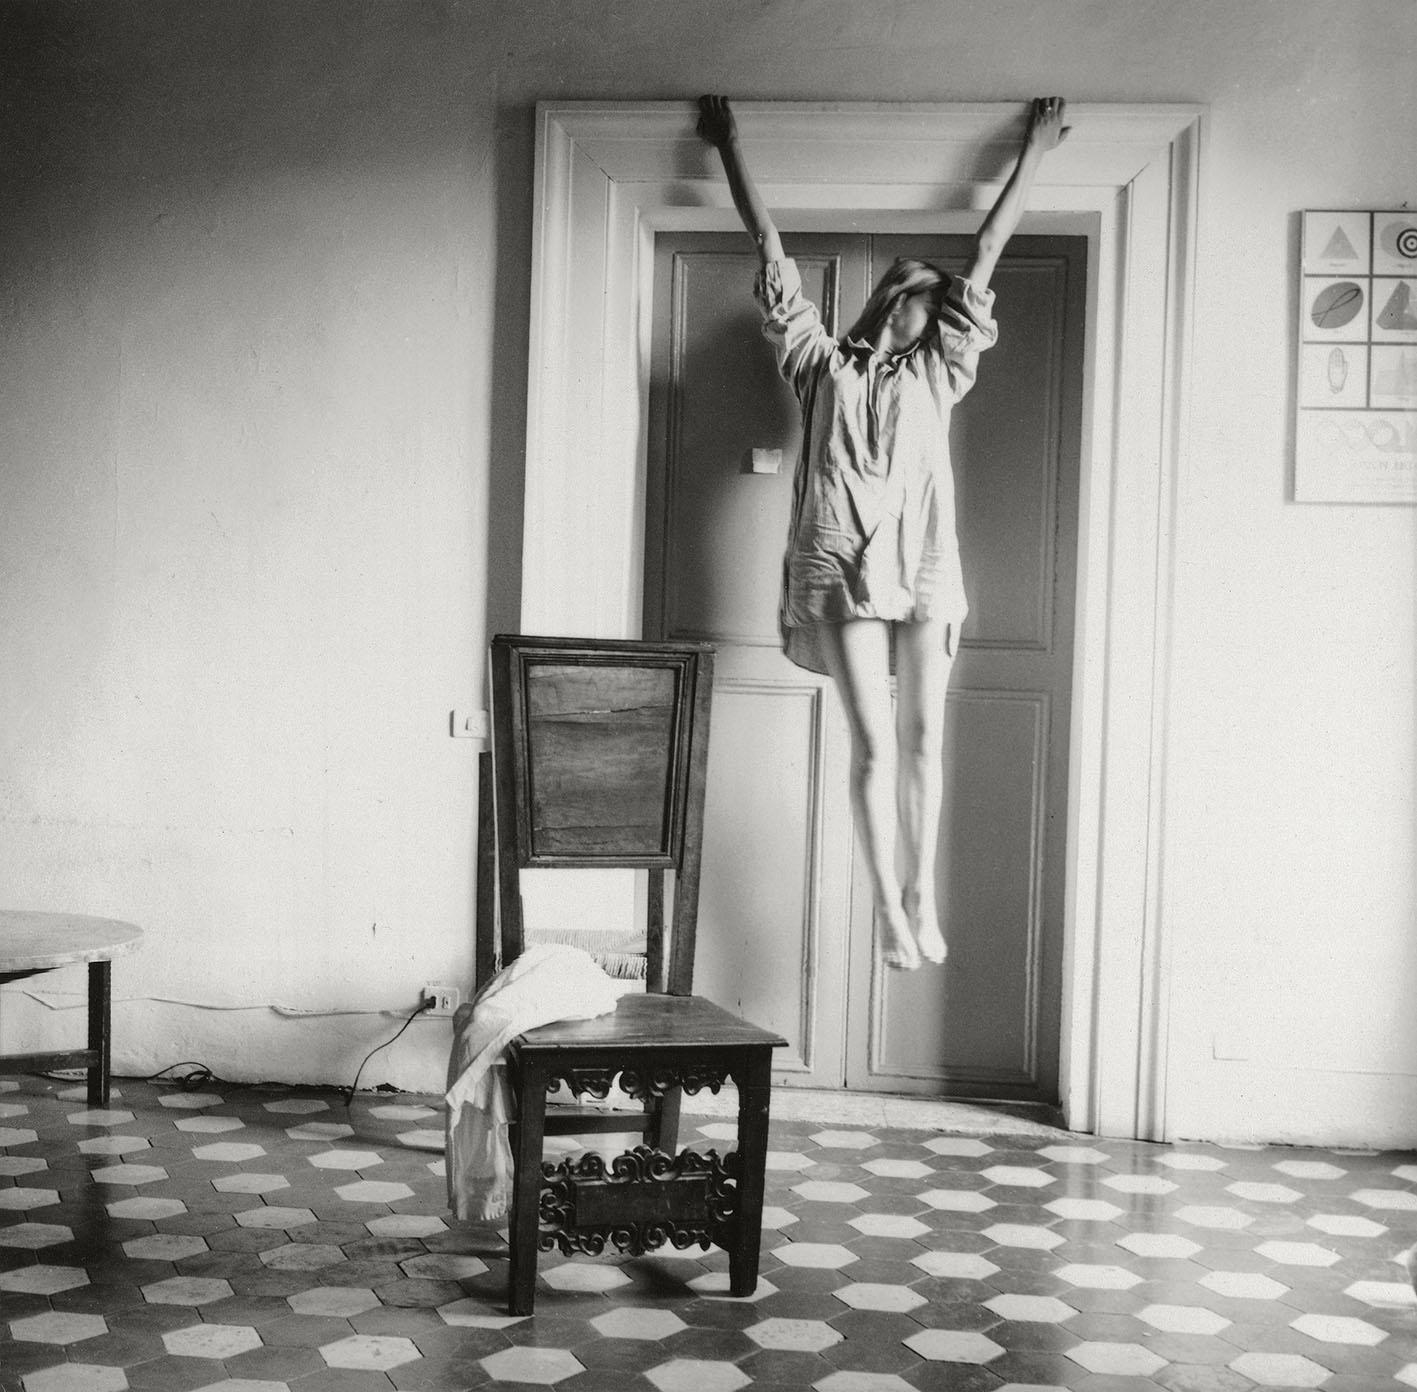 Francesca Woodman, Untitled, 1977-1978. © Betty and George Woodman.